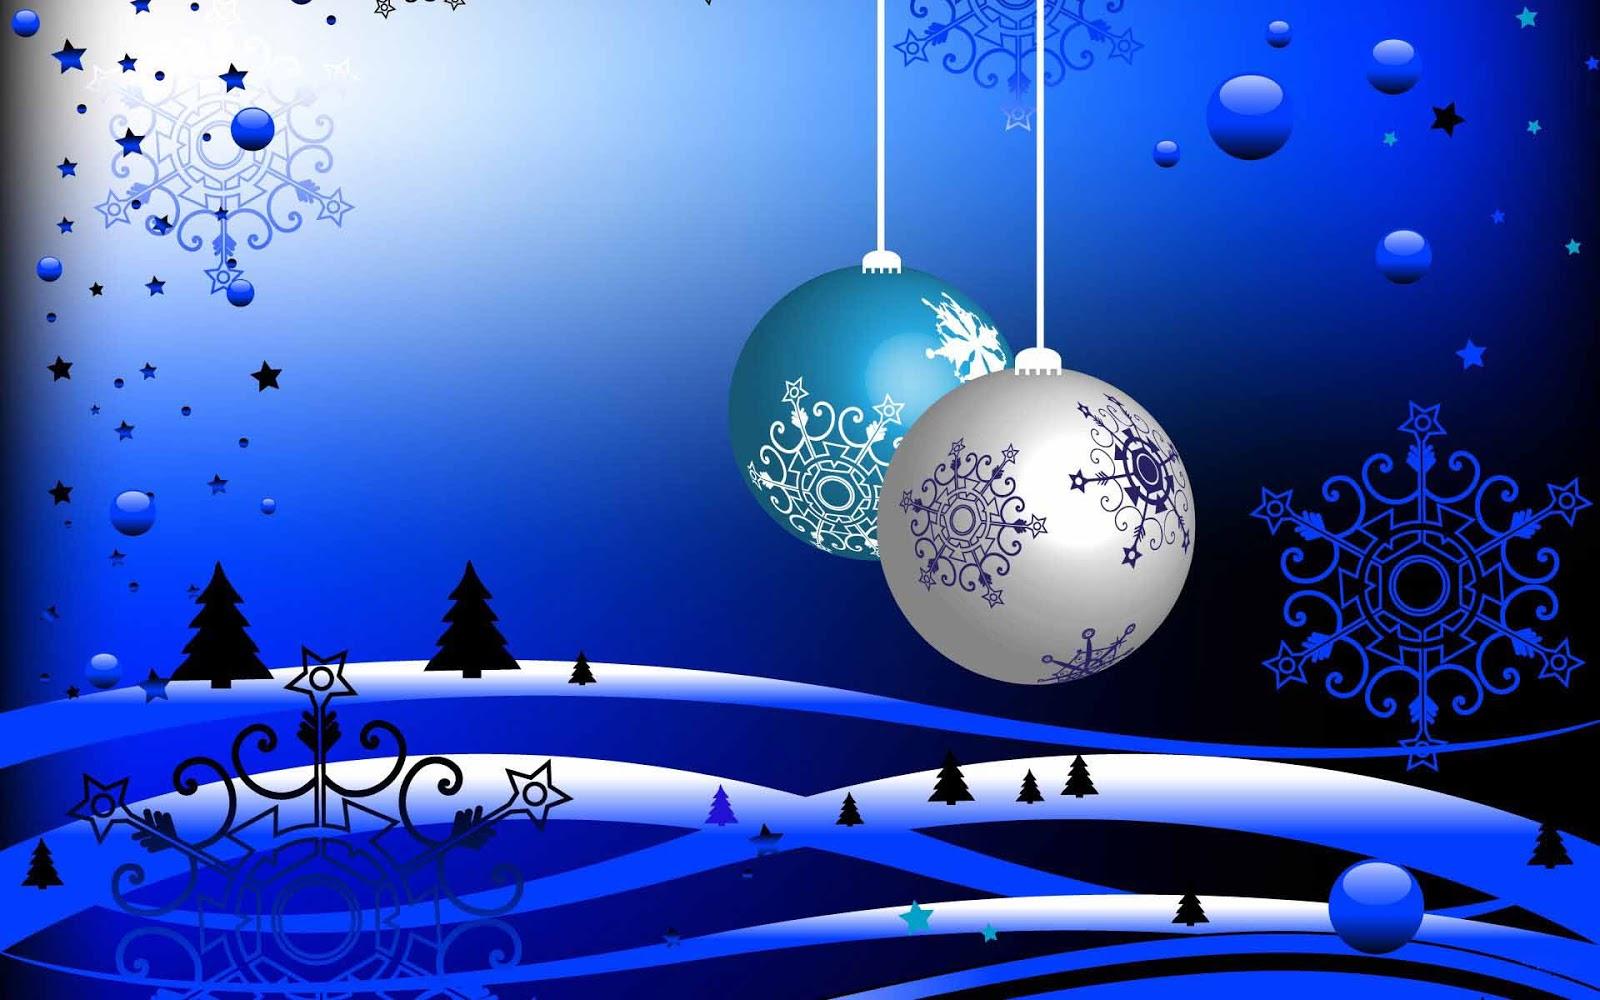 HD Wallpapers: Christmas Desktop HD Wallpapers